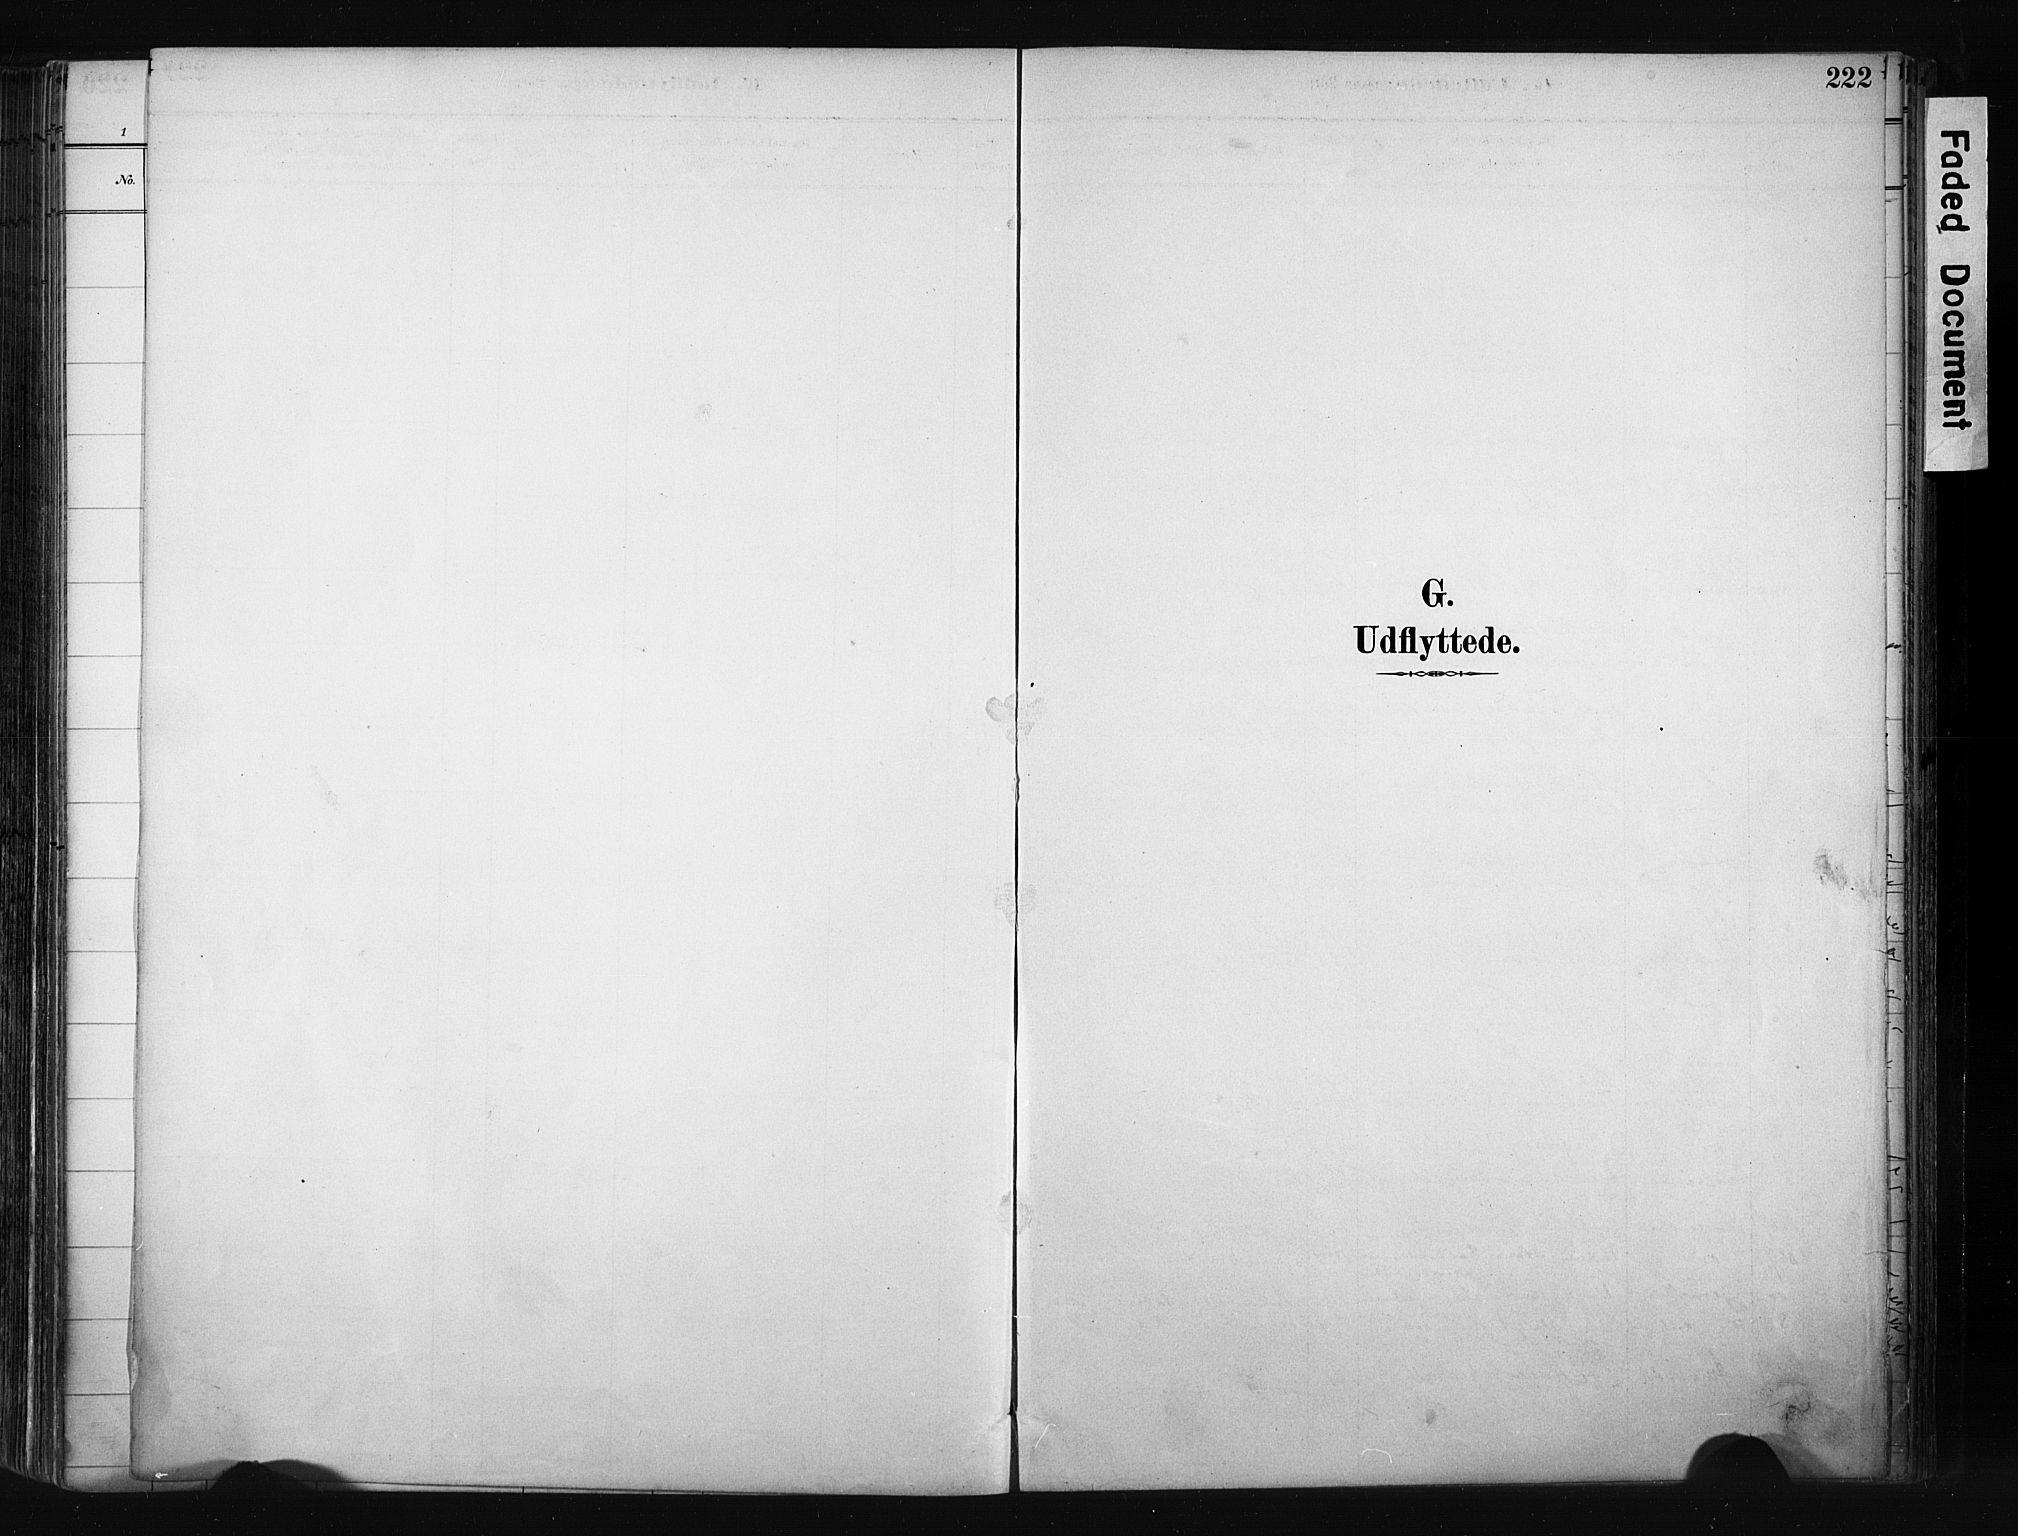 SAH, Gran prestekontor, Ministerialbok nr. 17, 1889-1897, s. 222